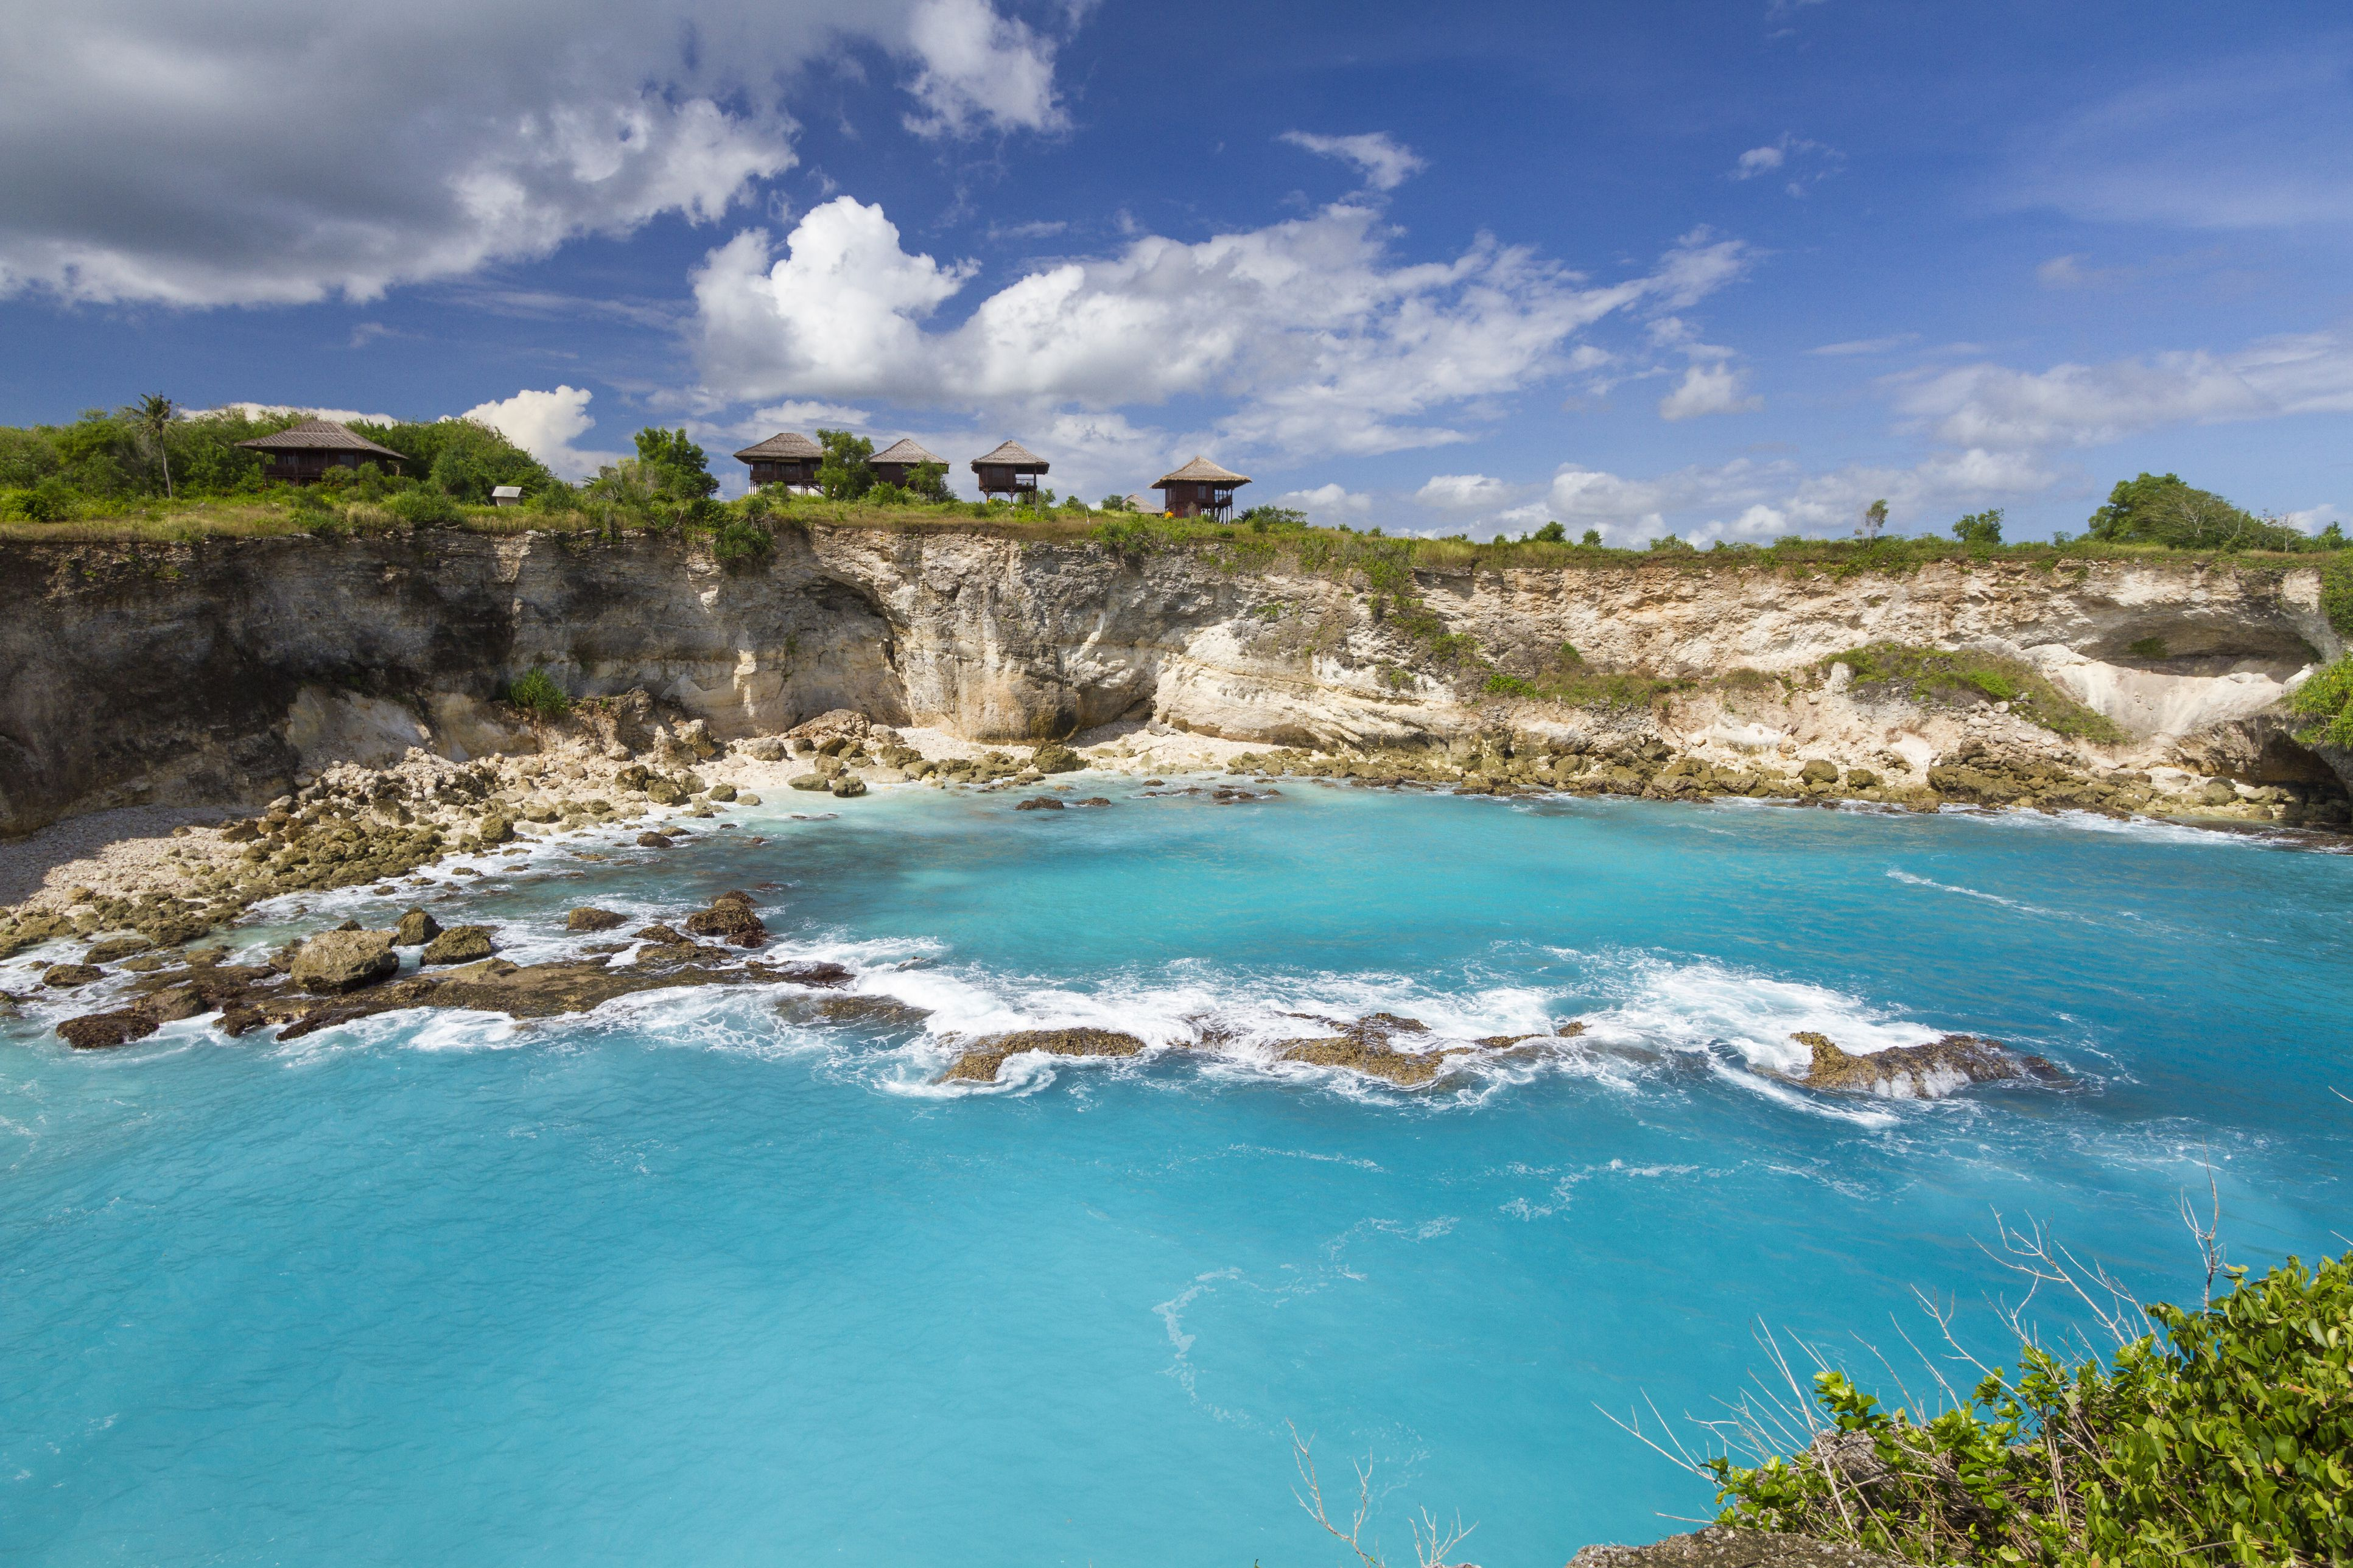 Indonesia, Bali, Nusa Ceningan, Blue lagoon